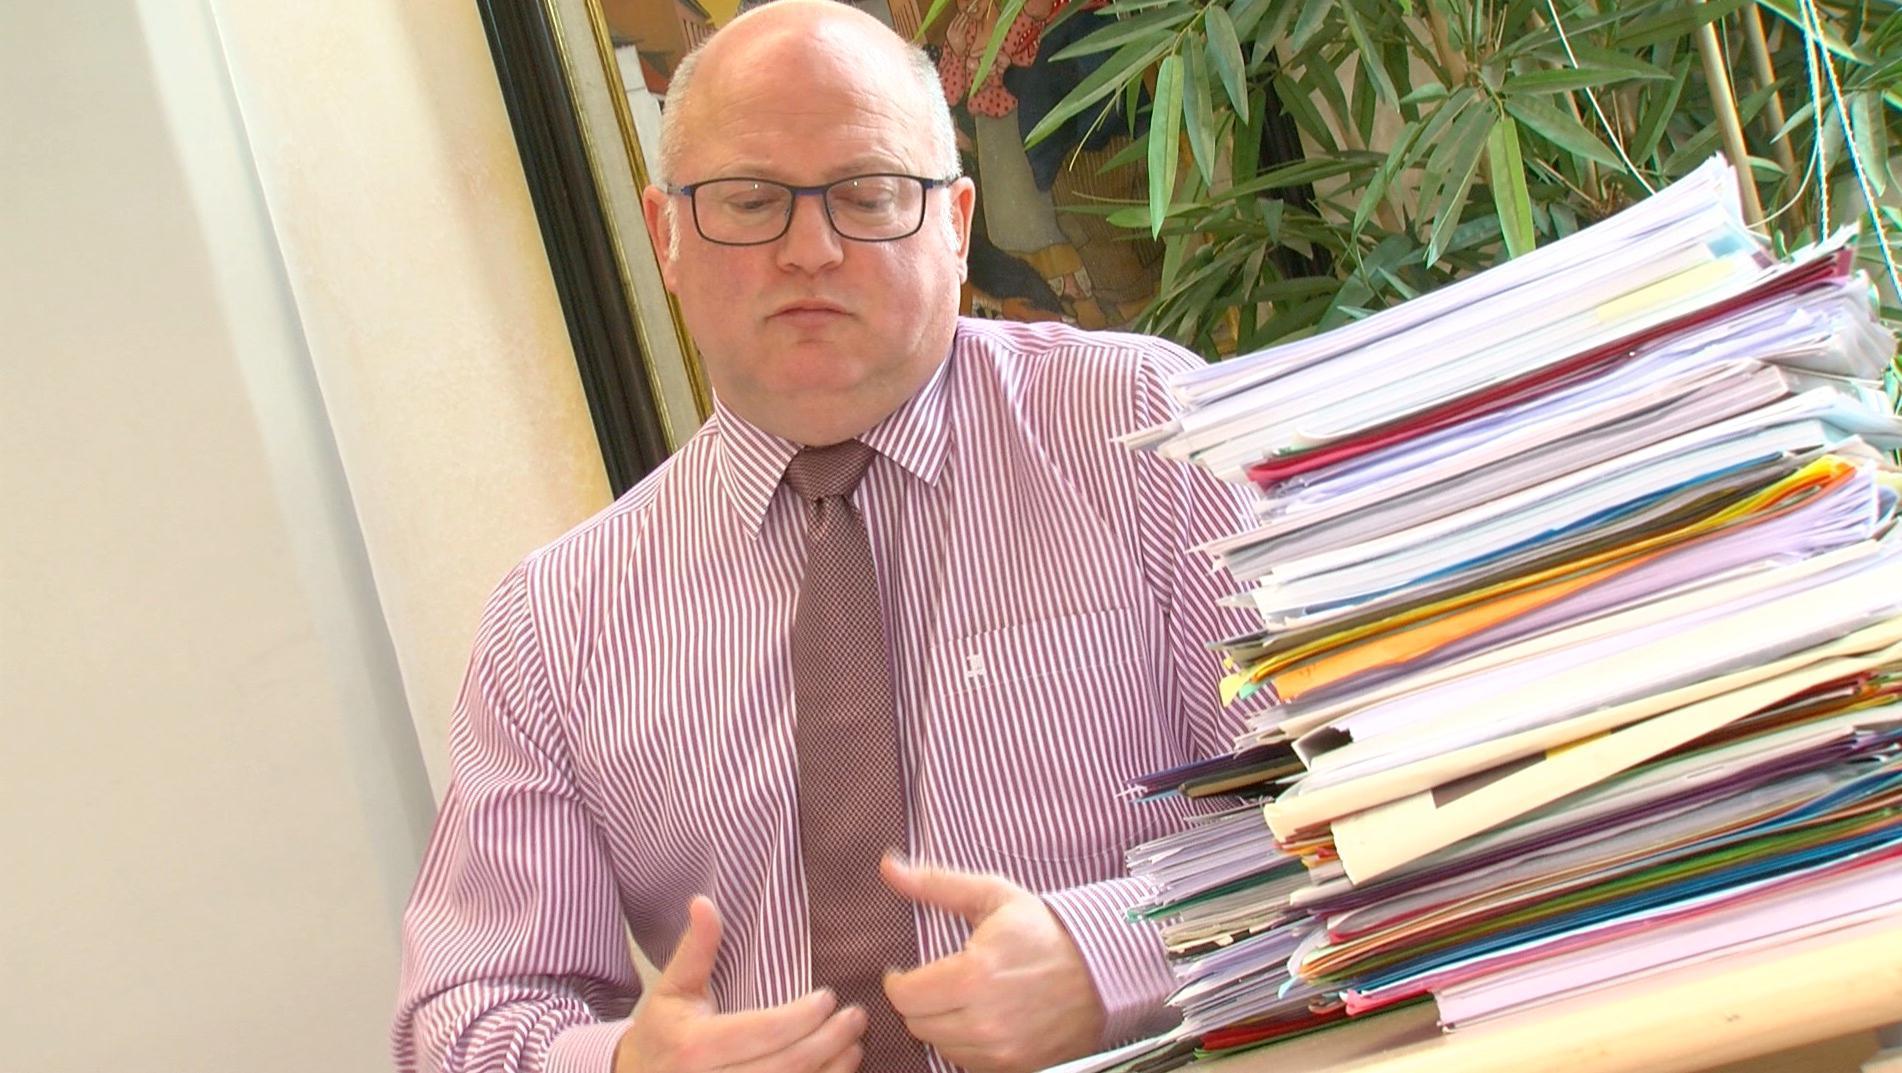 Nethys assigne en justice Jean-Luc Crucke